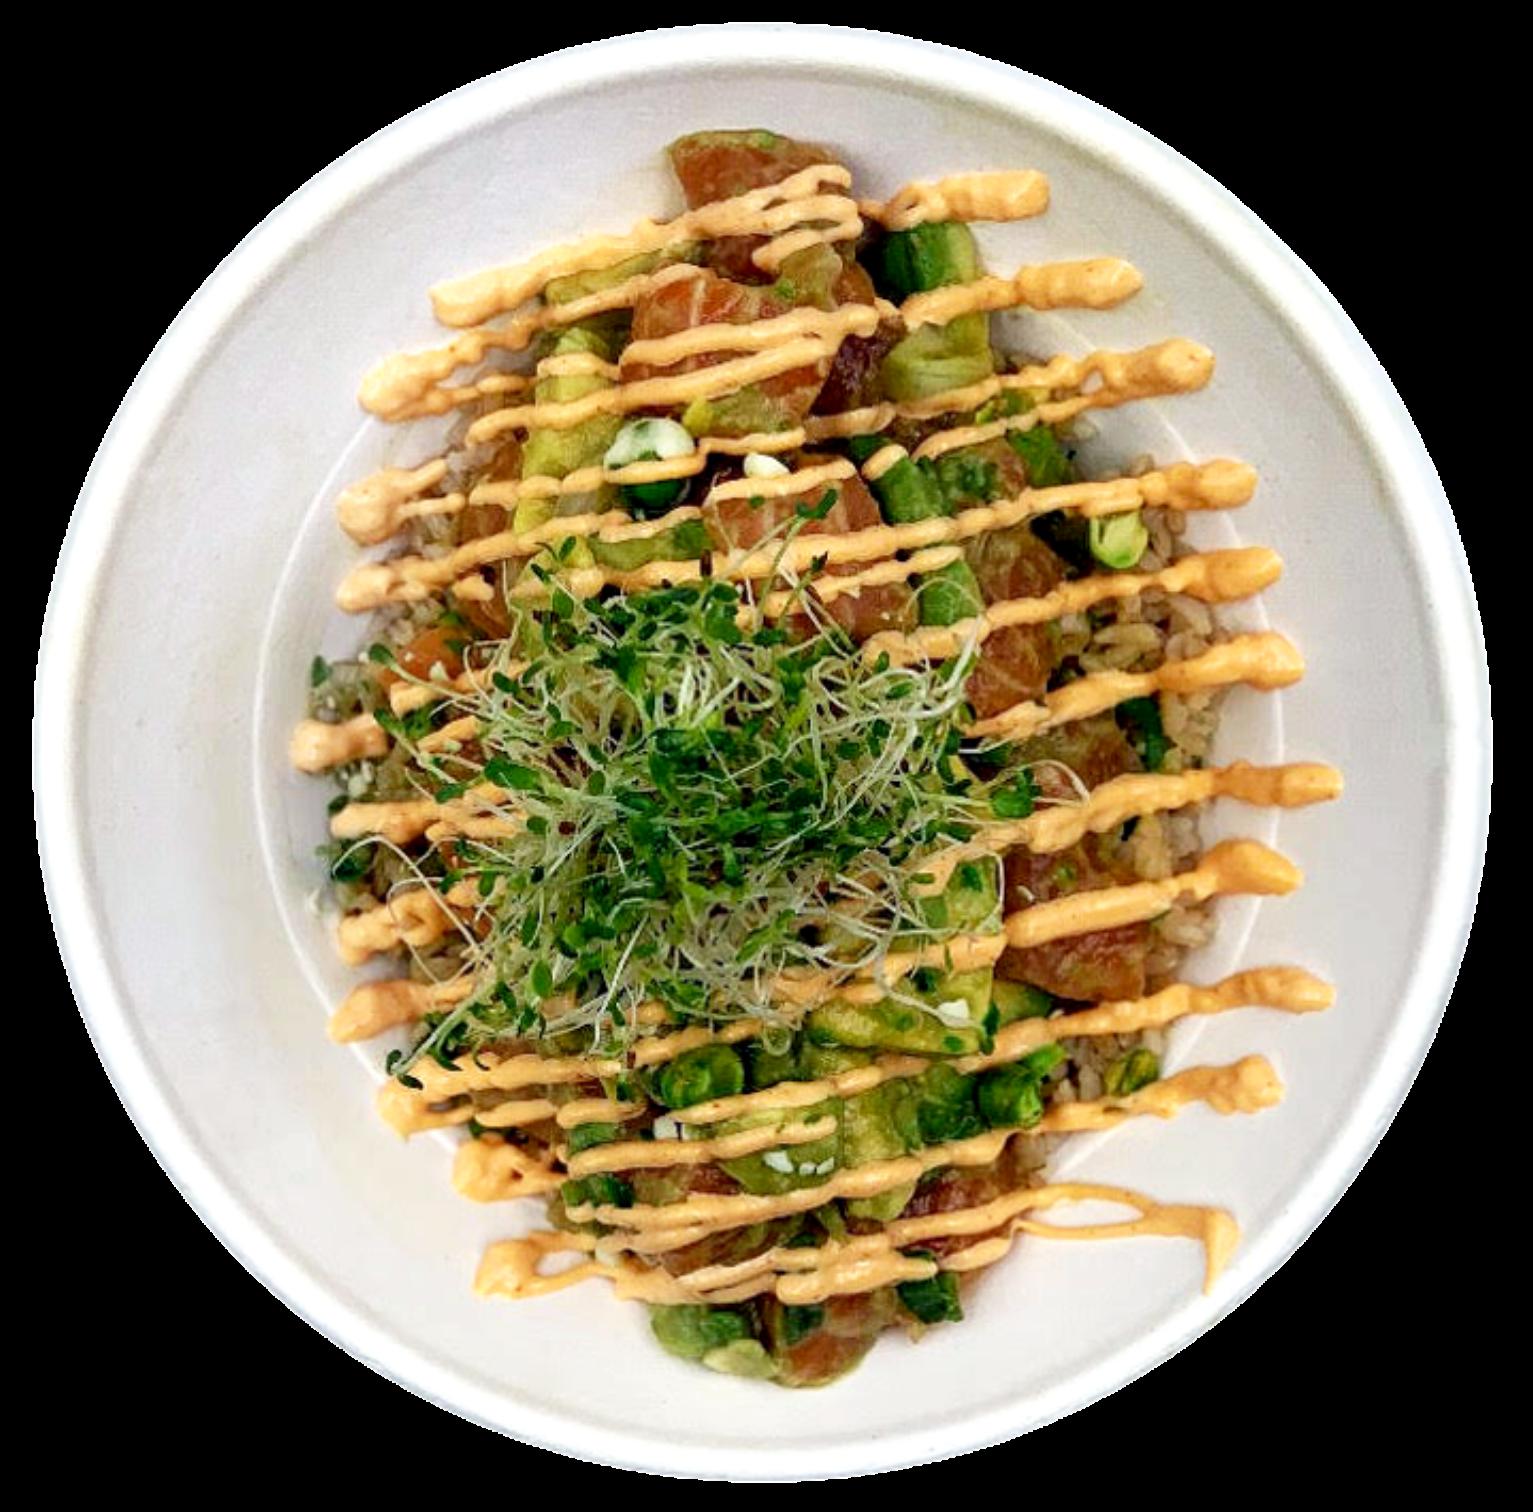 Salmon Avocado Bowl